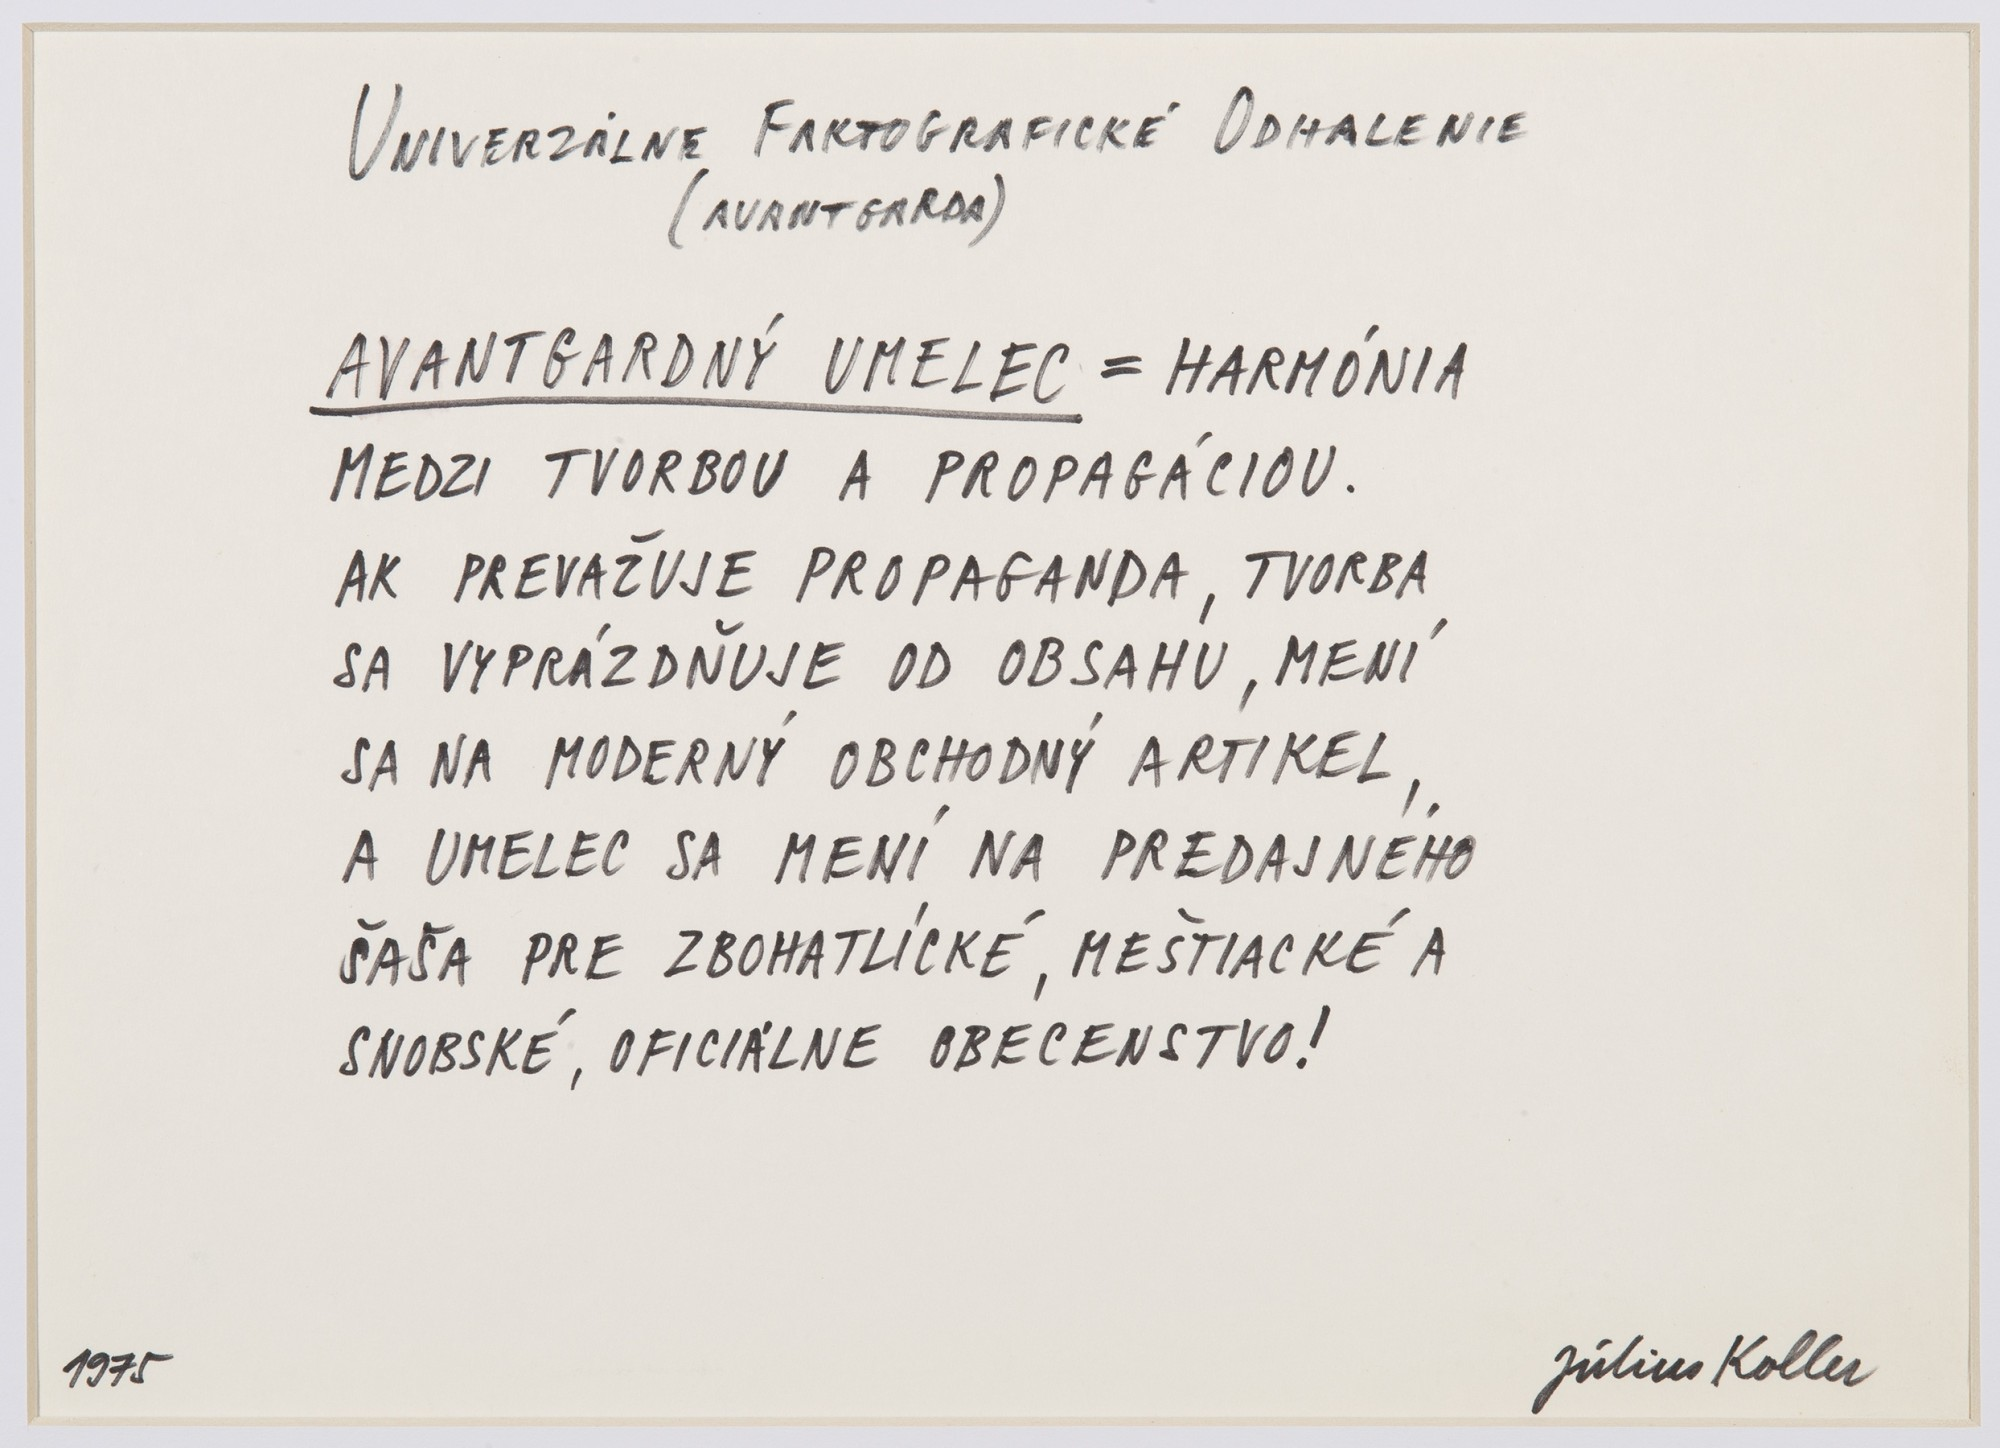 "<span class=""link fancybox-details-link""><a href=""/artists/155-julius-koller/works/10133/"">View Detail Page</a></span><div class=""artist""><span class=""artist""><strong>JULIUS KOLLER</strong></span></div><div class=""title""><em>Untitled (Avantgarde)</em>, 1975</div><div class=""signed_and_dated"">Signed lower right, dated lower left</div><div class=""medium"">Pen on paper</div><div class=""dimensions"">24 x 33 cm<br /> 9 ½ x 13 in</div>"